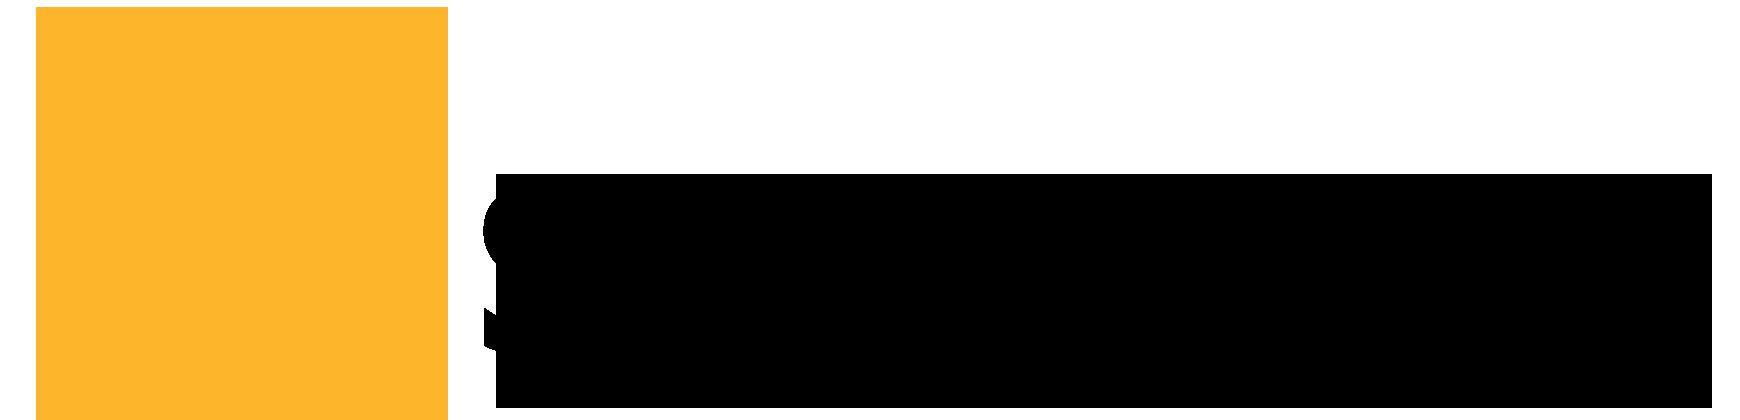 SillyComm - 北京易信通达科技